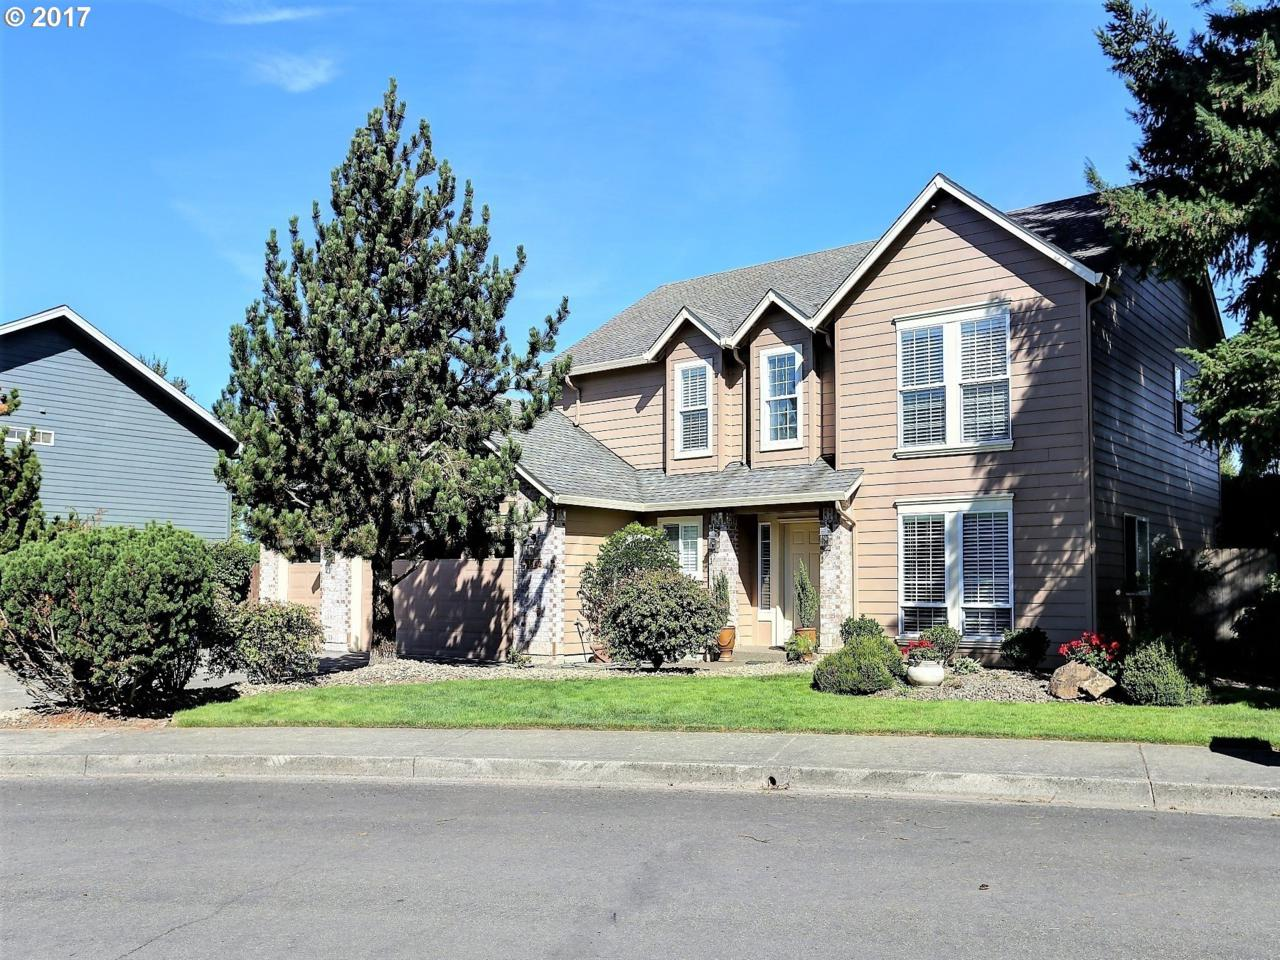 2642 NW Sunset Ct, Camas, WA 98607 (MLS #17514613) :: The Dale Chumbley Group